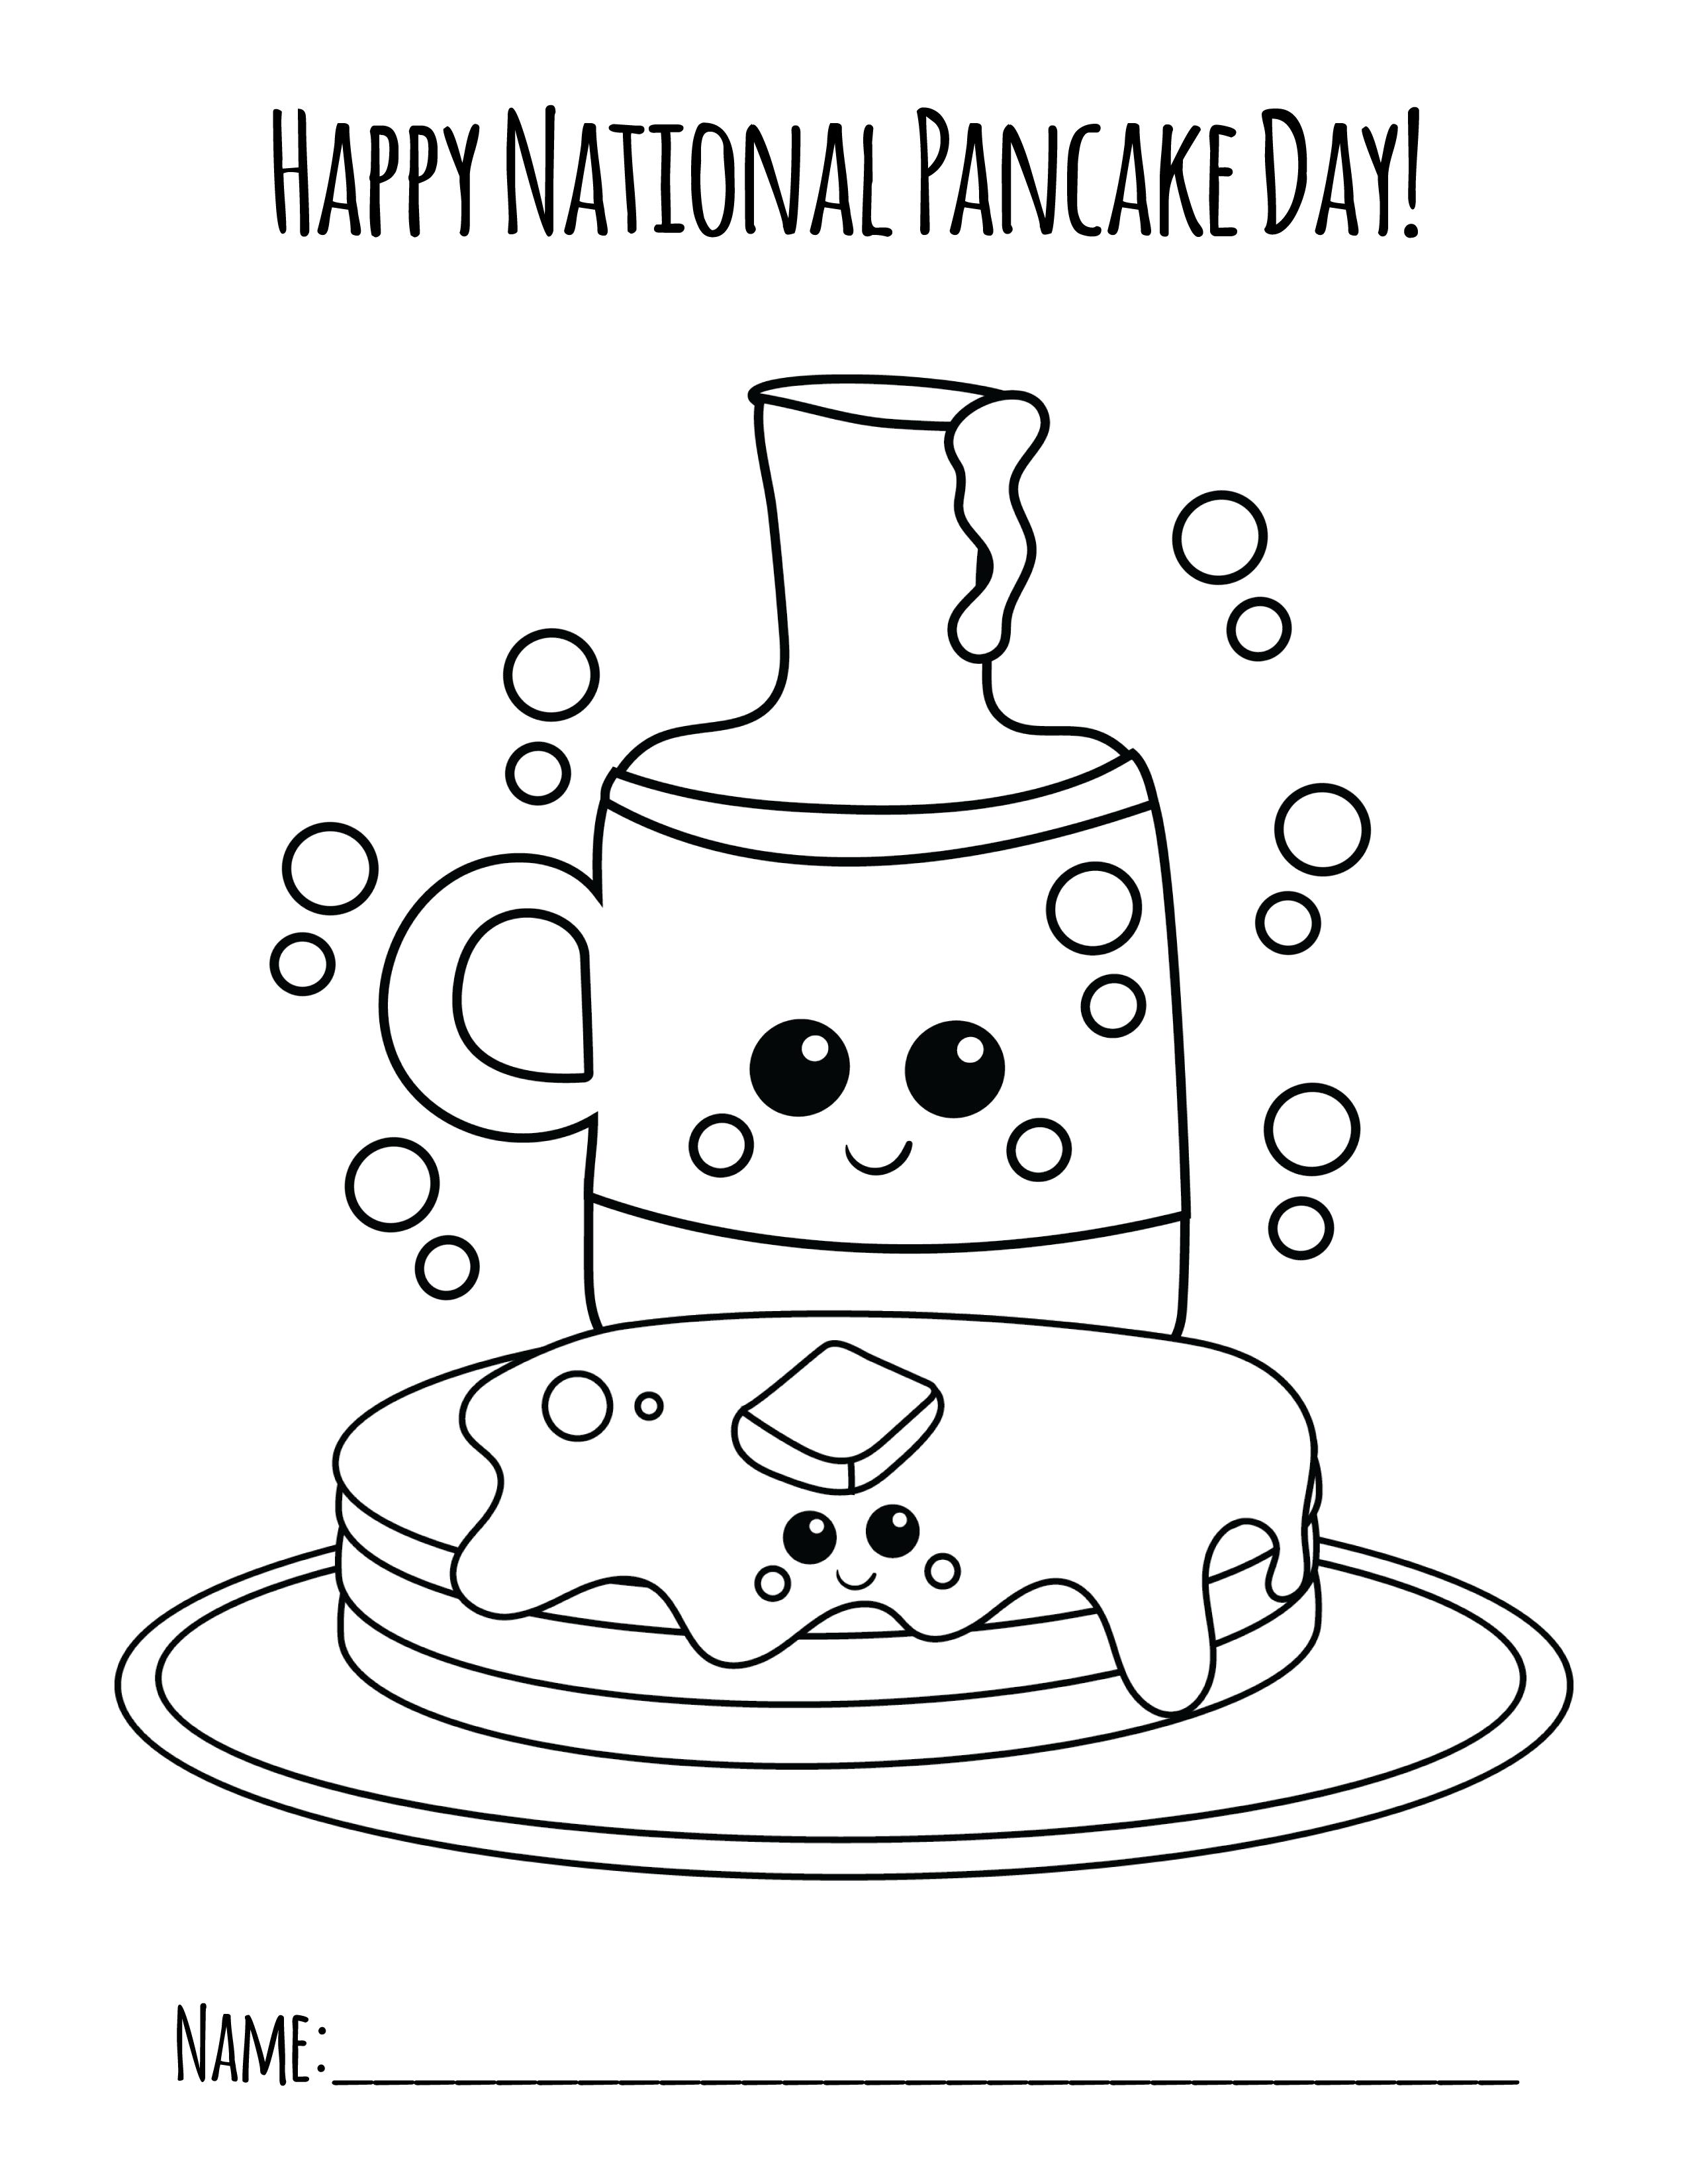 National Pancake Day Coloring Page